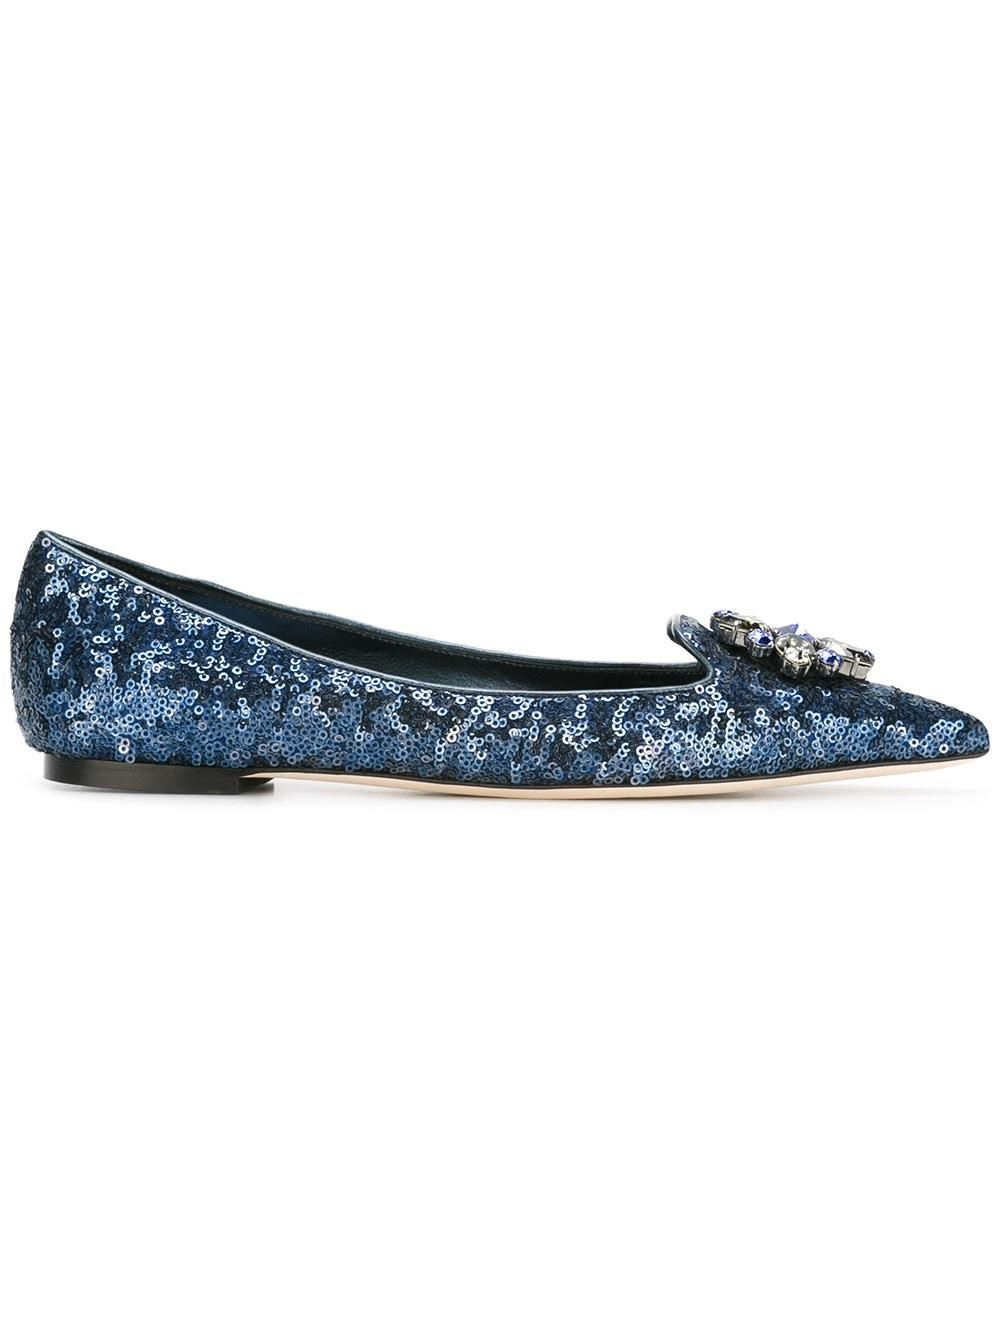 ecee06200ad8 Dolce   Gabbana Bellucci Slippers - Farfetch